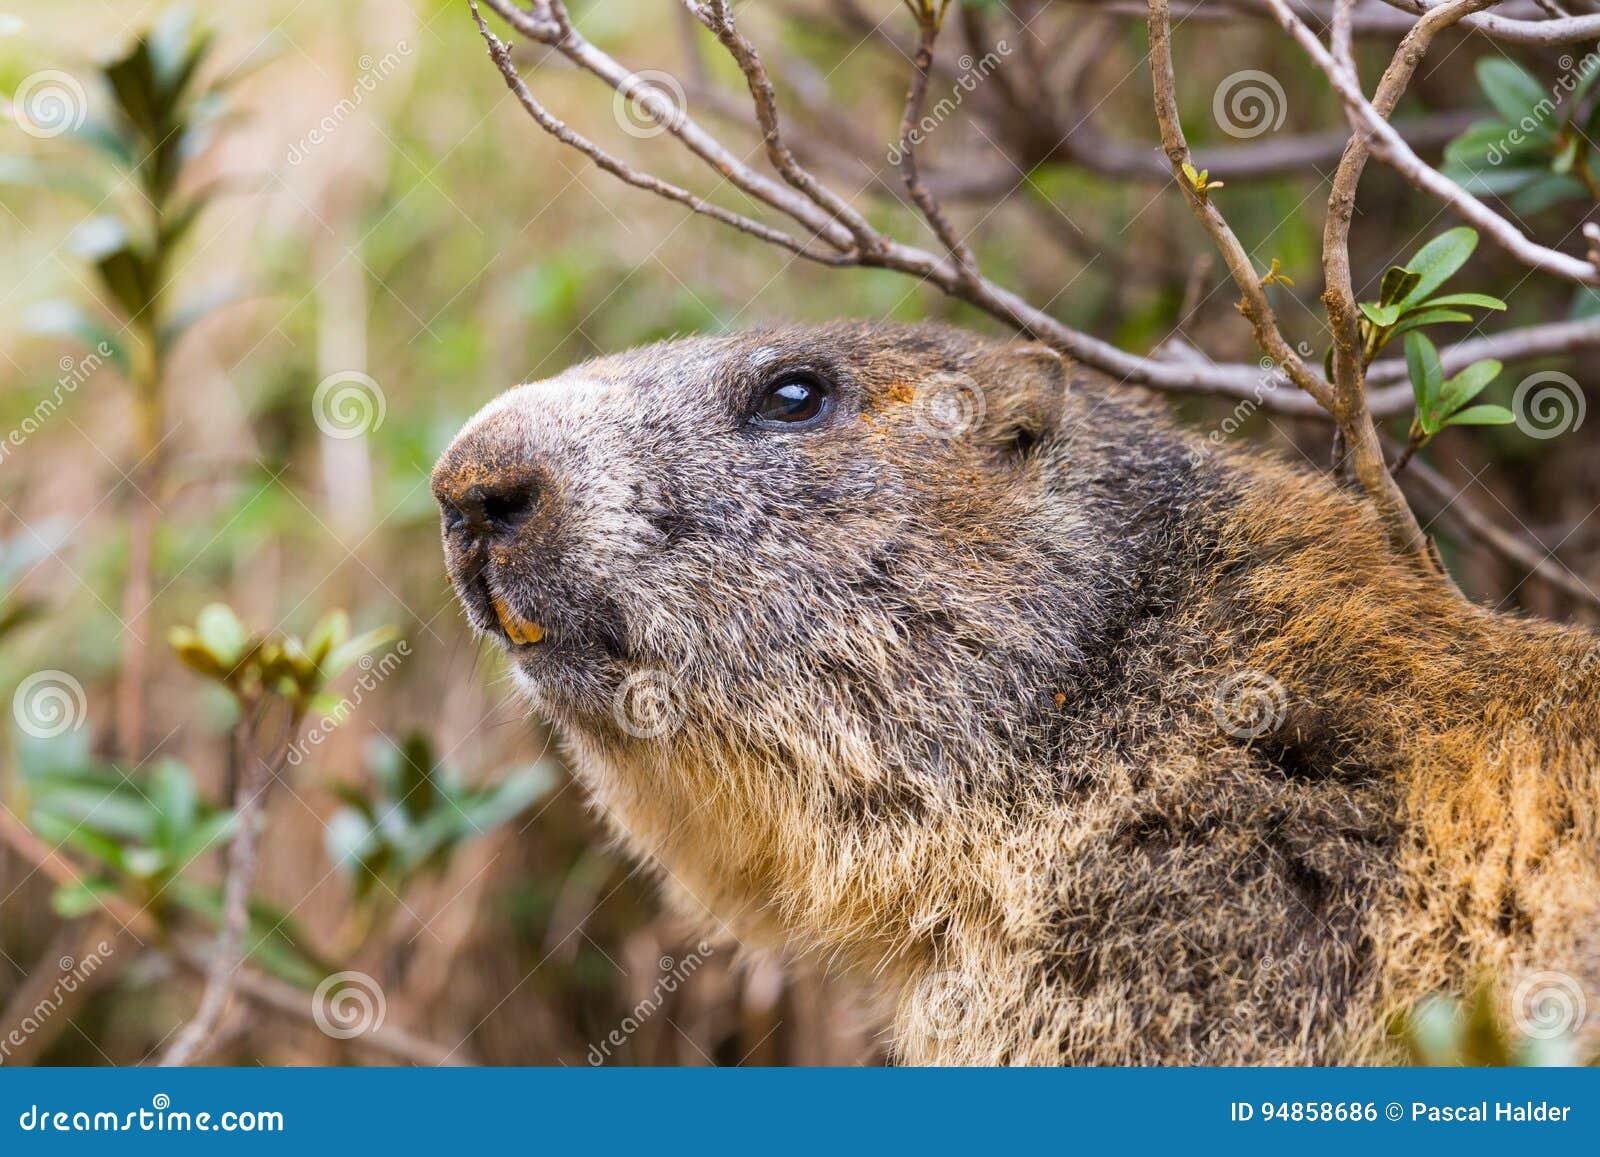 Detailed outdoor portrait of alpine groundhog Marmota monax